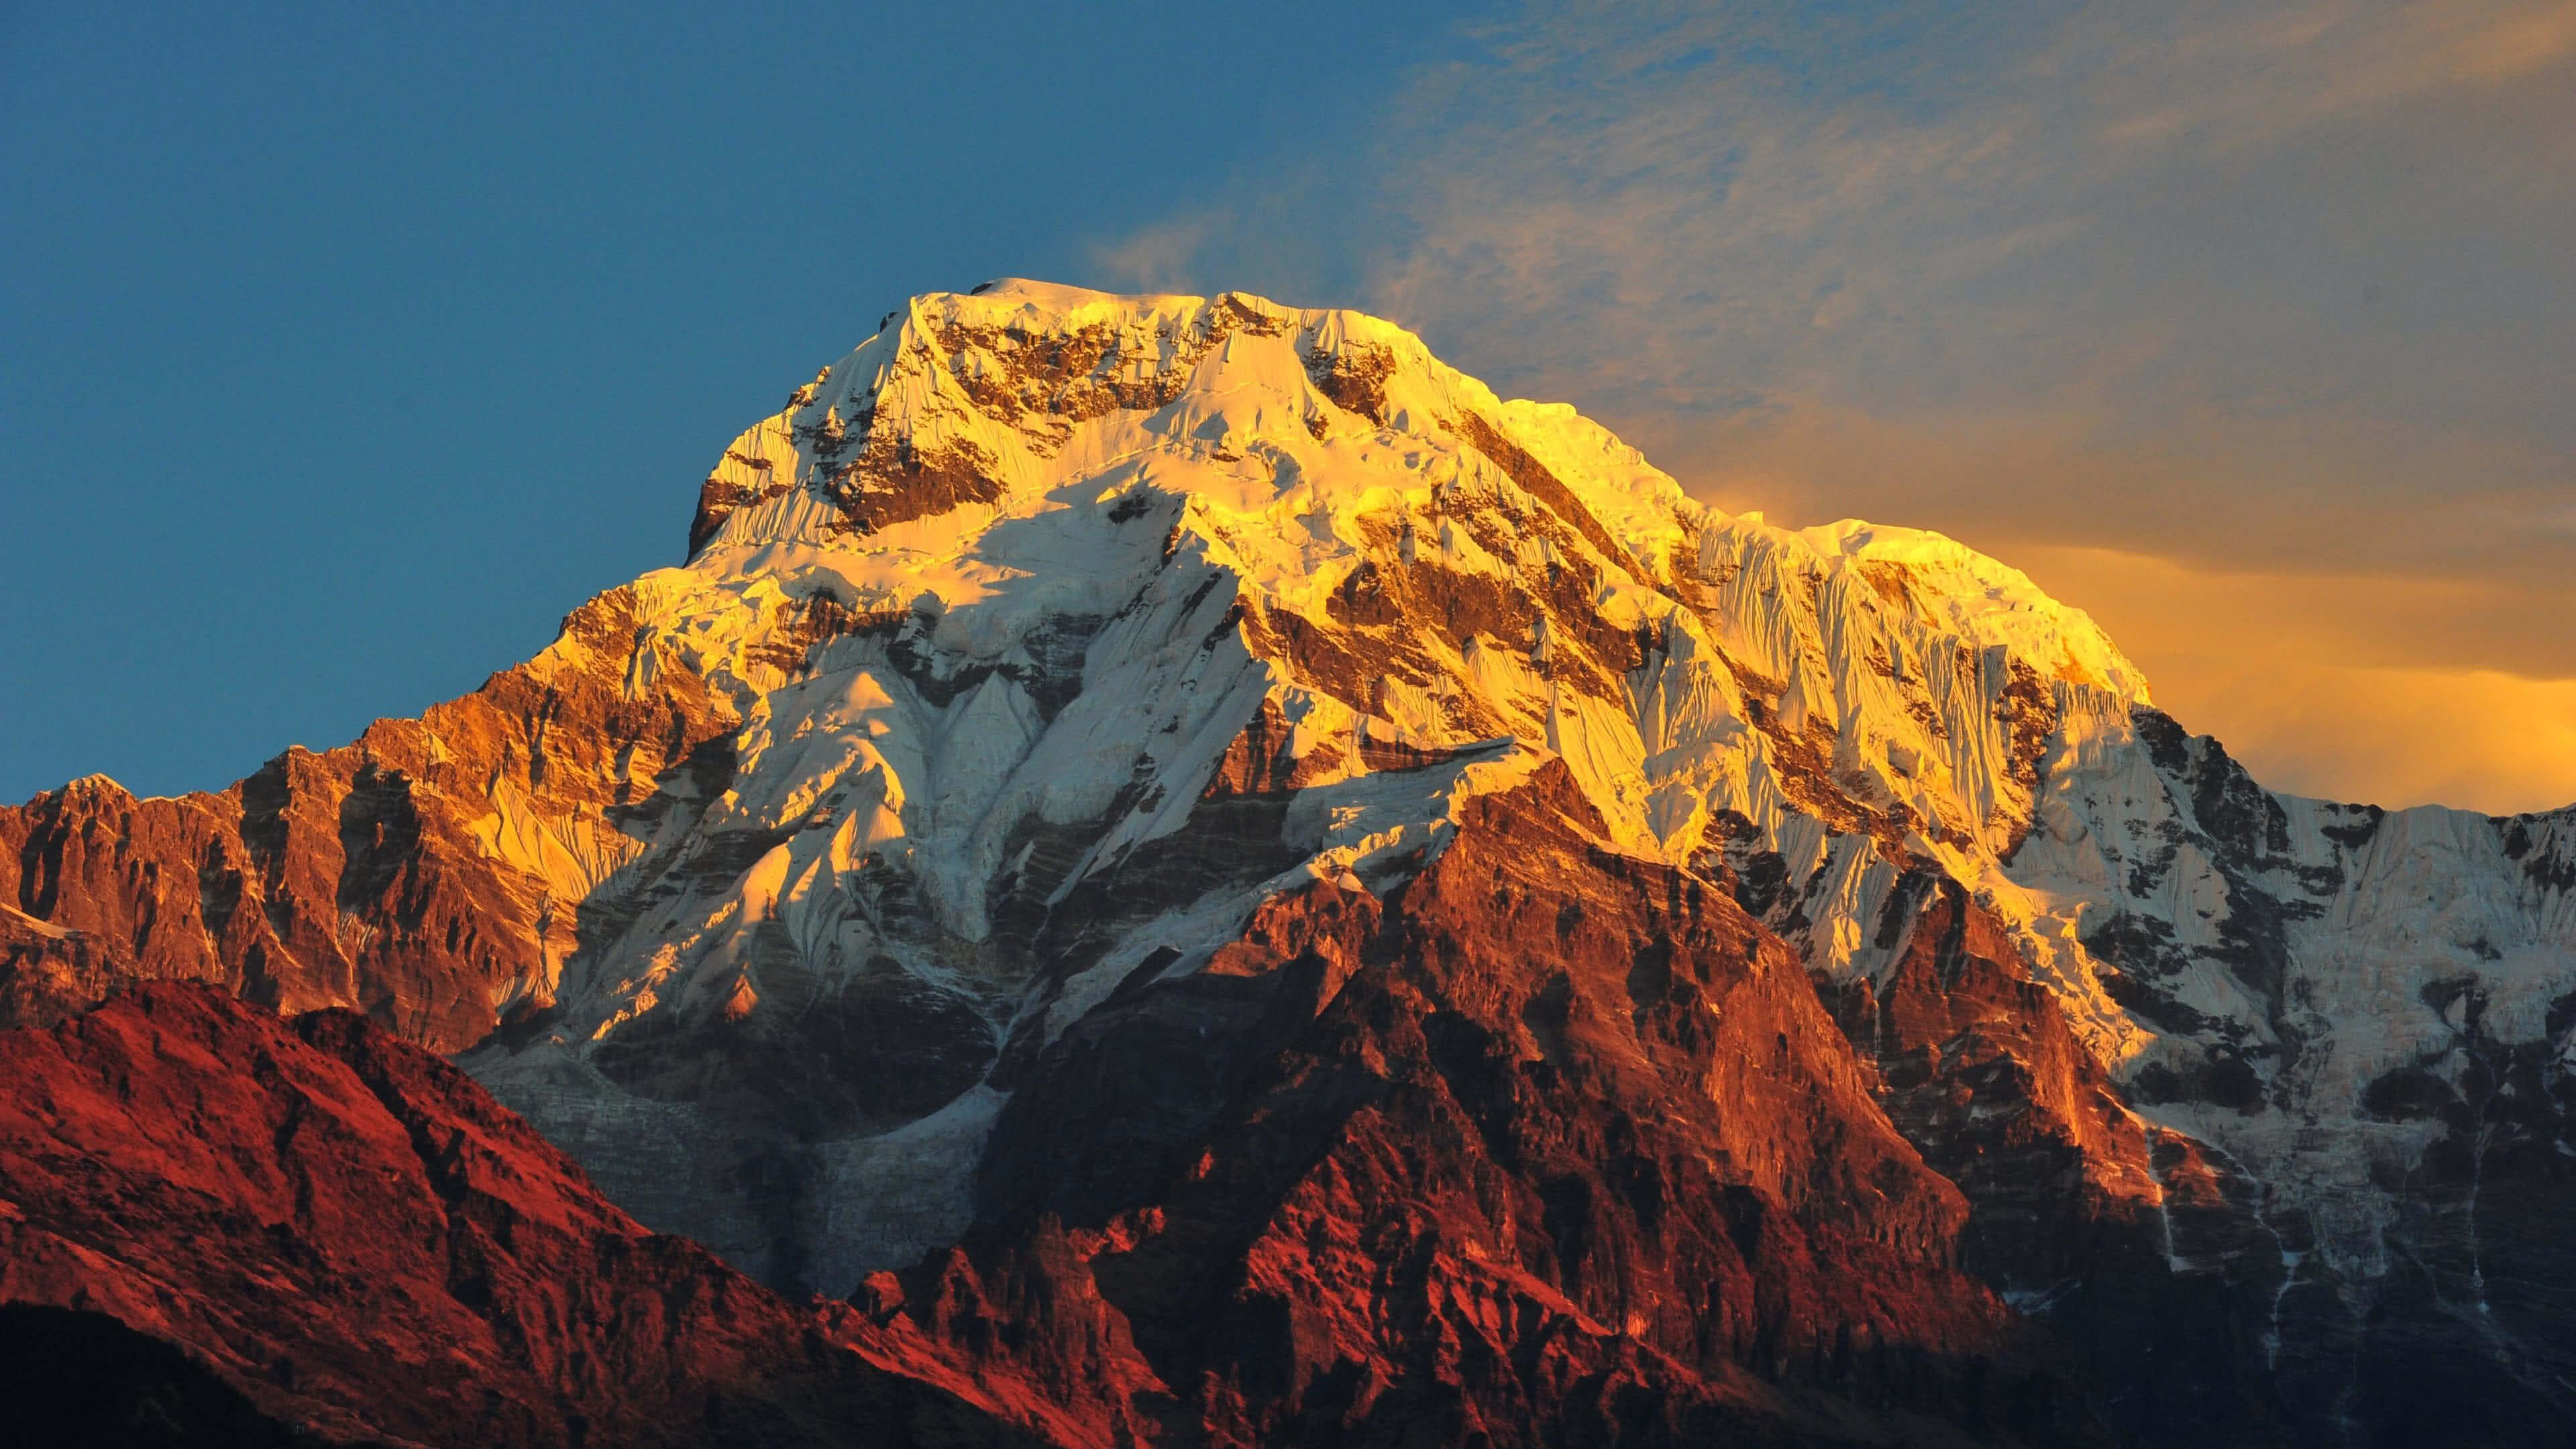 Annapurna Massif Himalayas Nepal UHD 4K Wallpaper